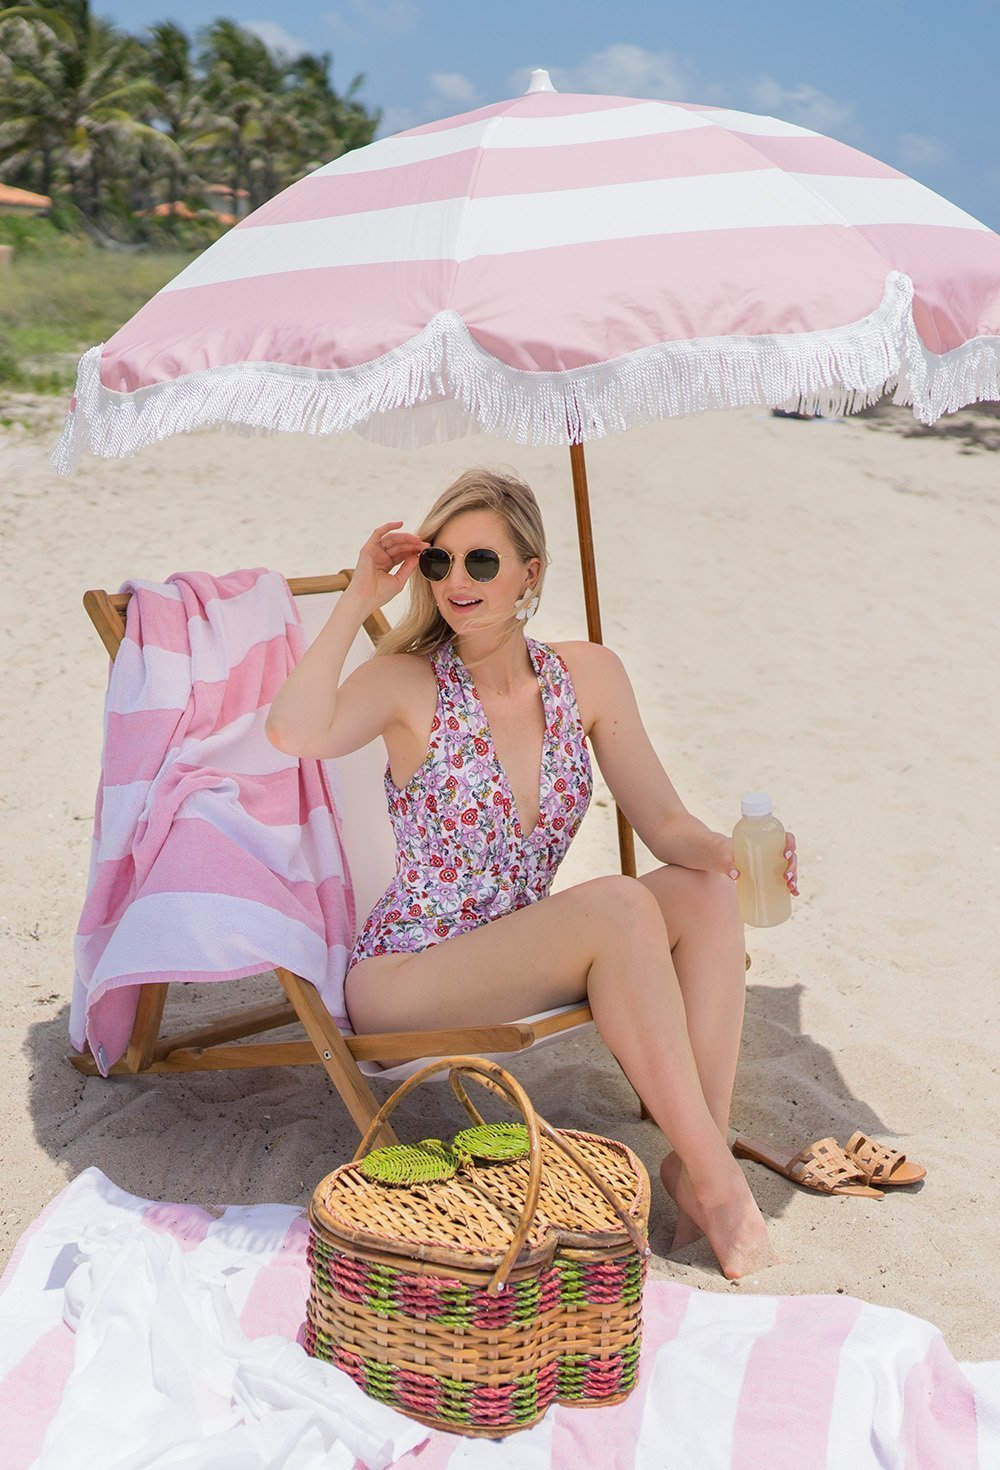 Ashley Brooke on the beach in Palm Beach, FL